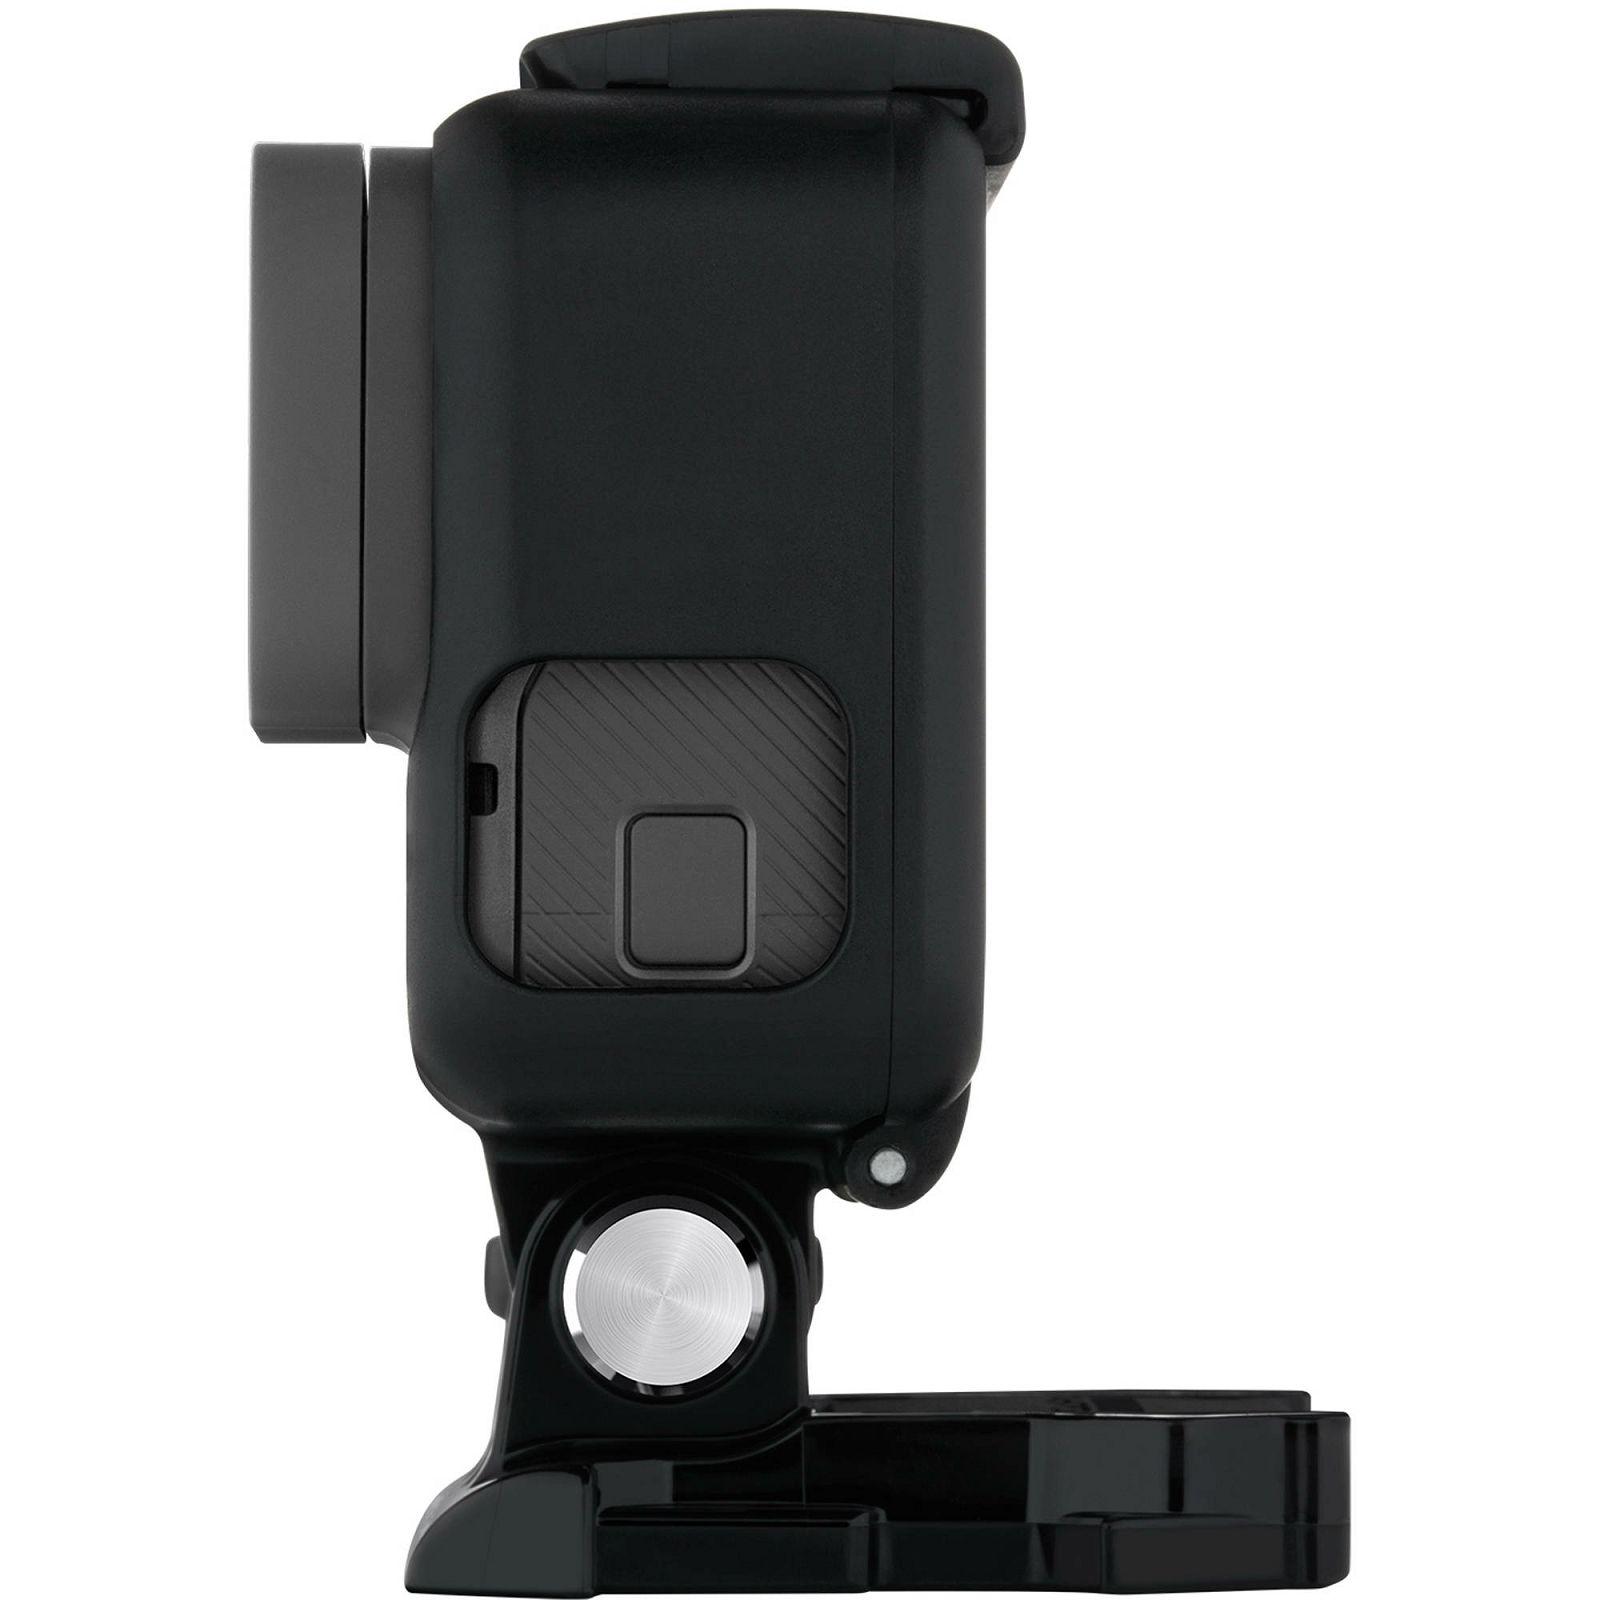 Gopro Hero5 Black Edition 4k 120p 12mpx Wifi Gps Sportska Akcijska Kabel 35mm Mic Adapter Cable For Hero 3 Digitalna Kamera Chdhx 501 Eu